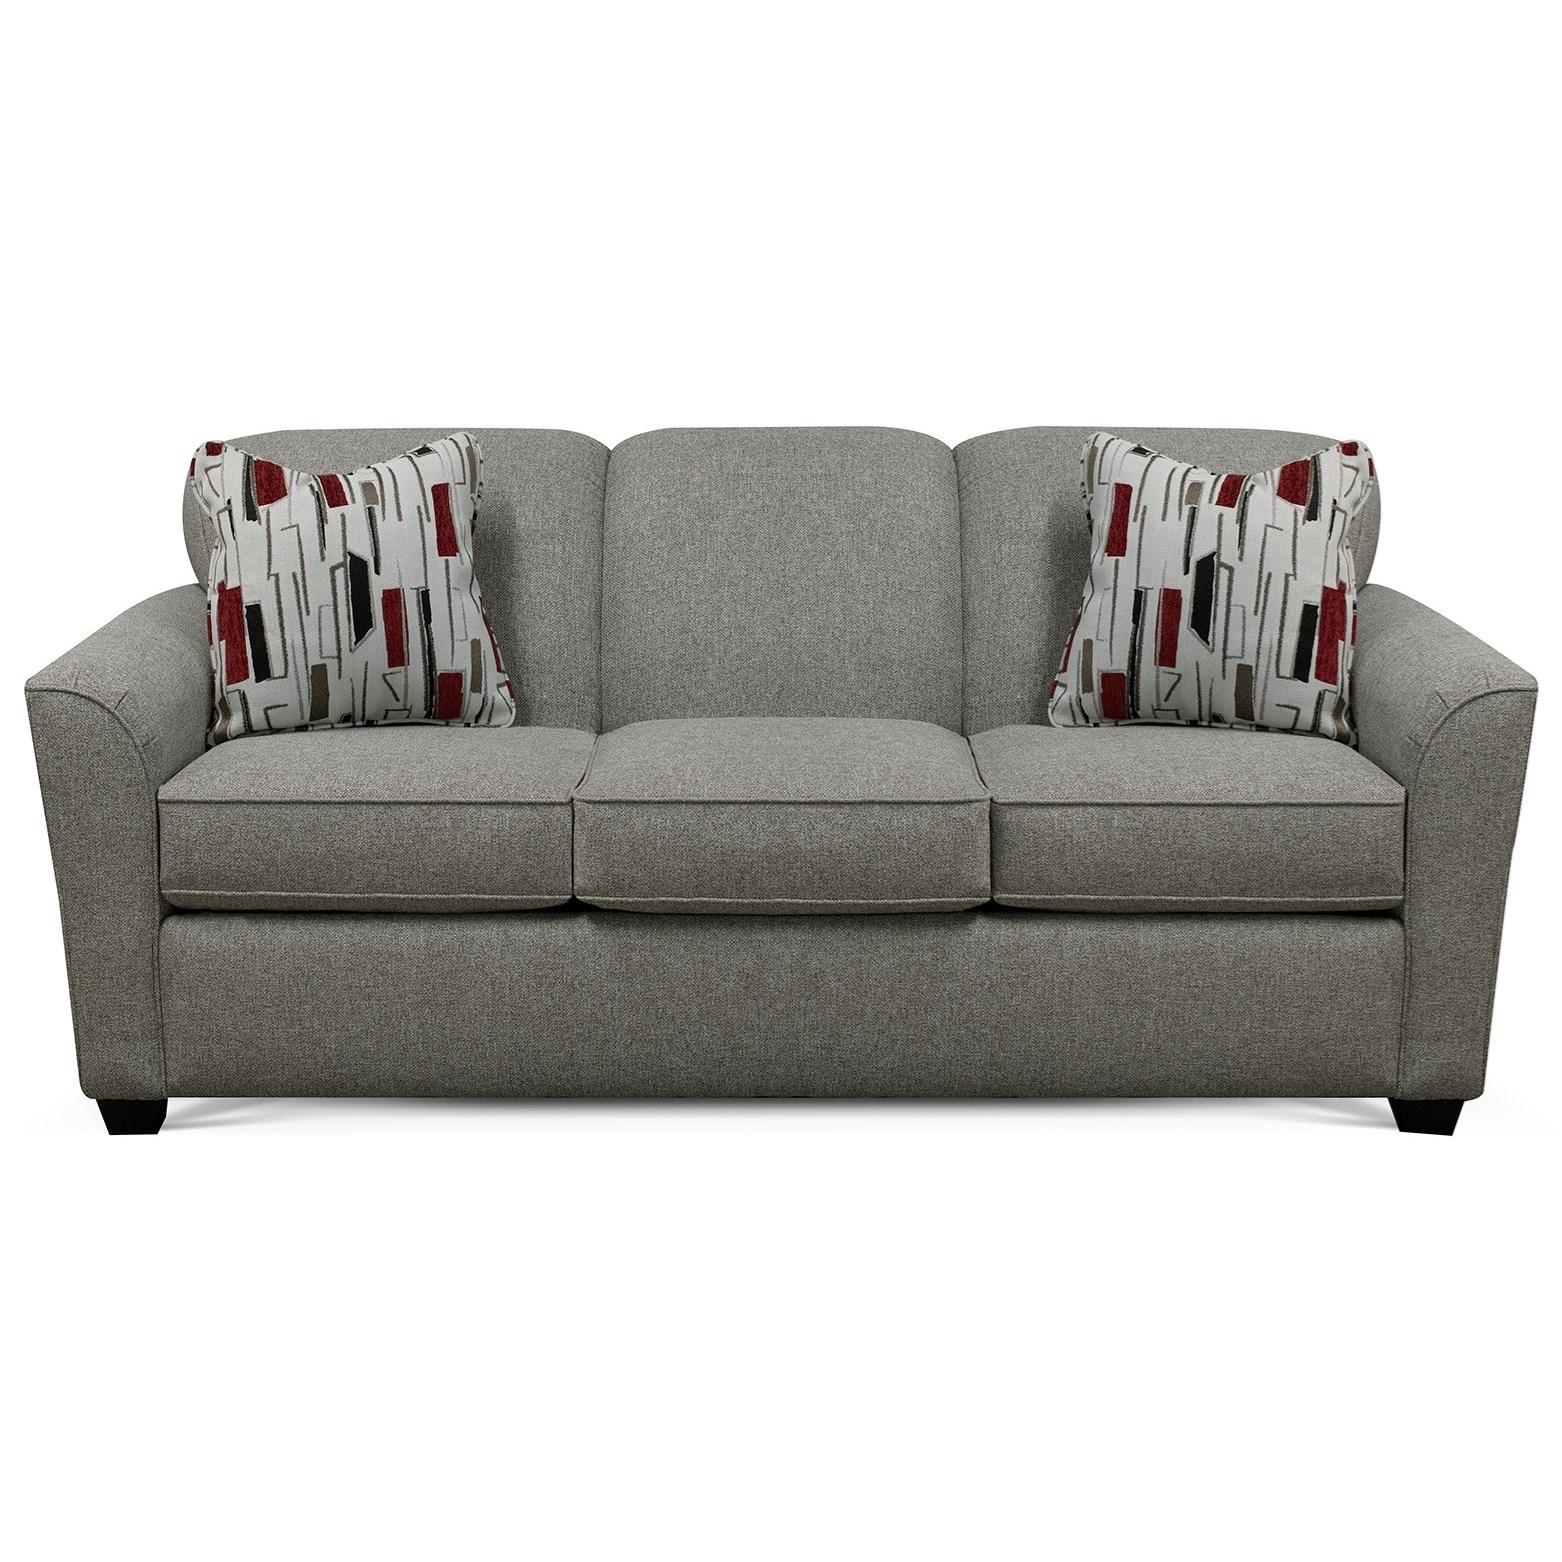 Contemporary Queen Sleeper Sofa with Innerspring Mattress